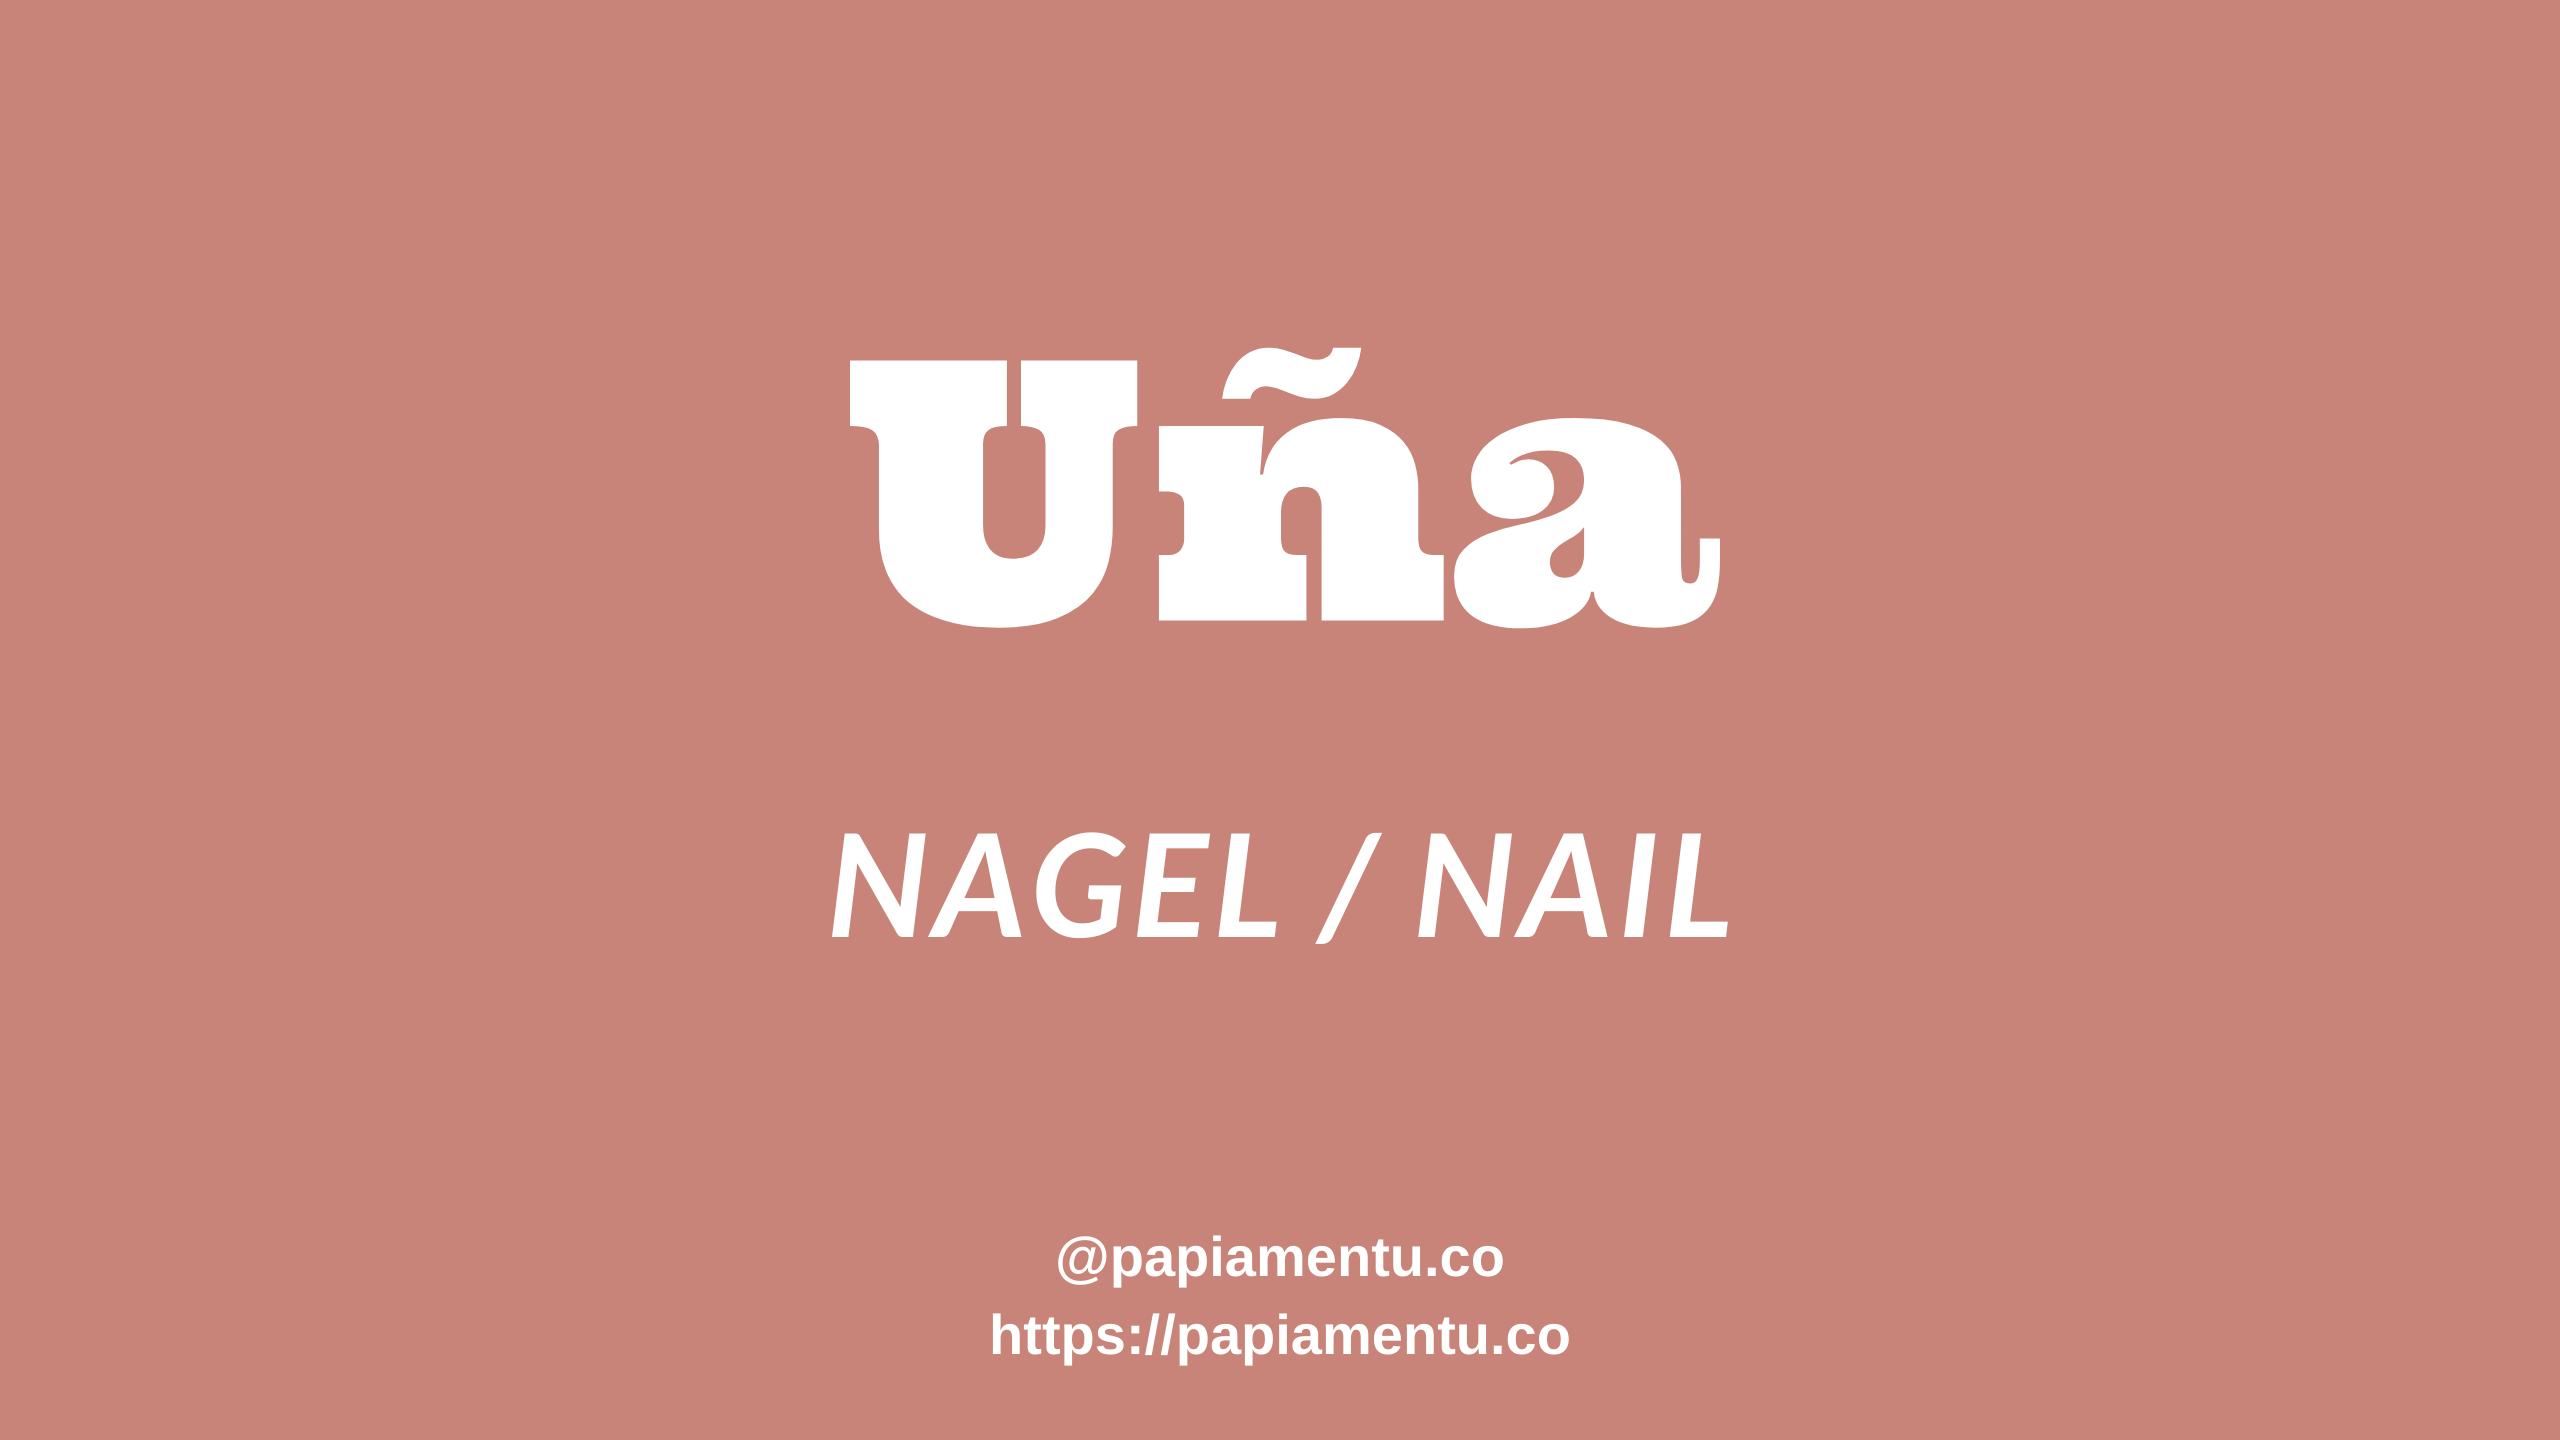 Nail / Nagel / Uña in Papiamentu / Papiaments